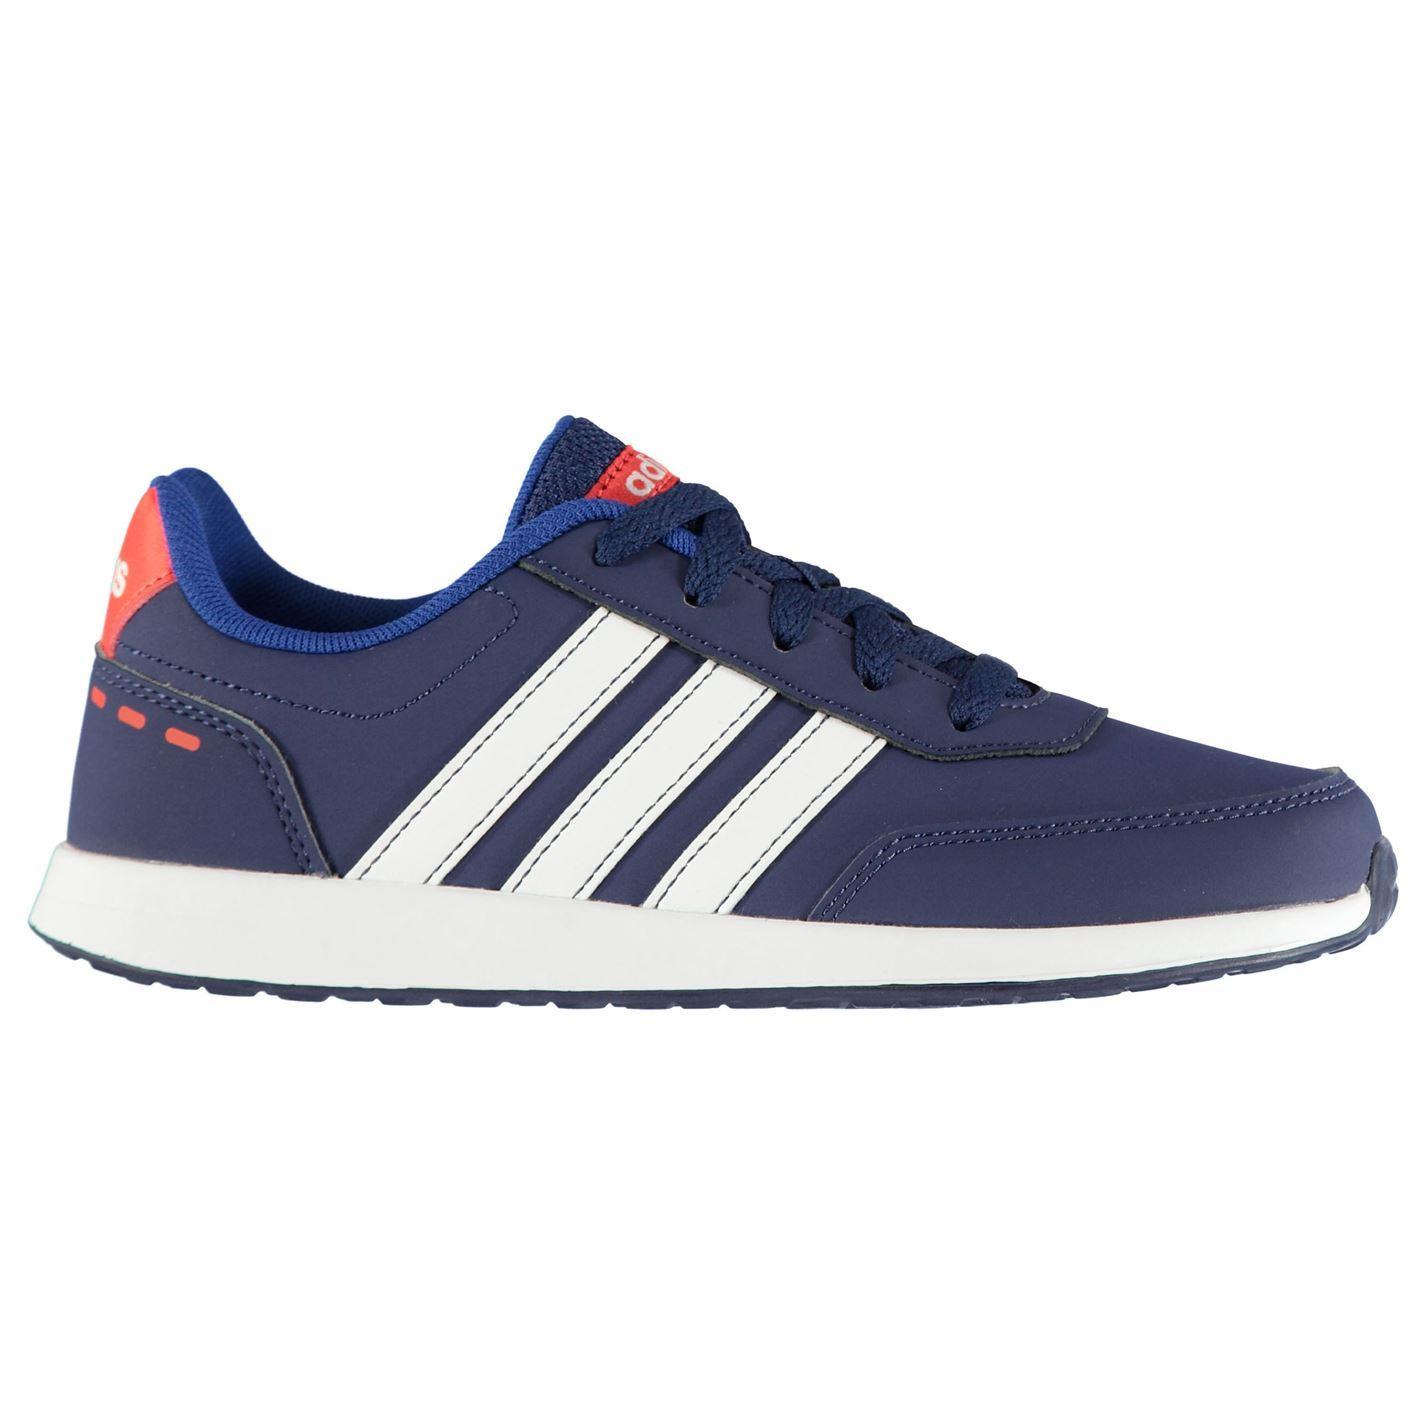 miniatura 7 - ADIDAS-Switch-Nubuck-Scarpe-da-ginnastica-bambino-ragazzo-calzature